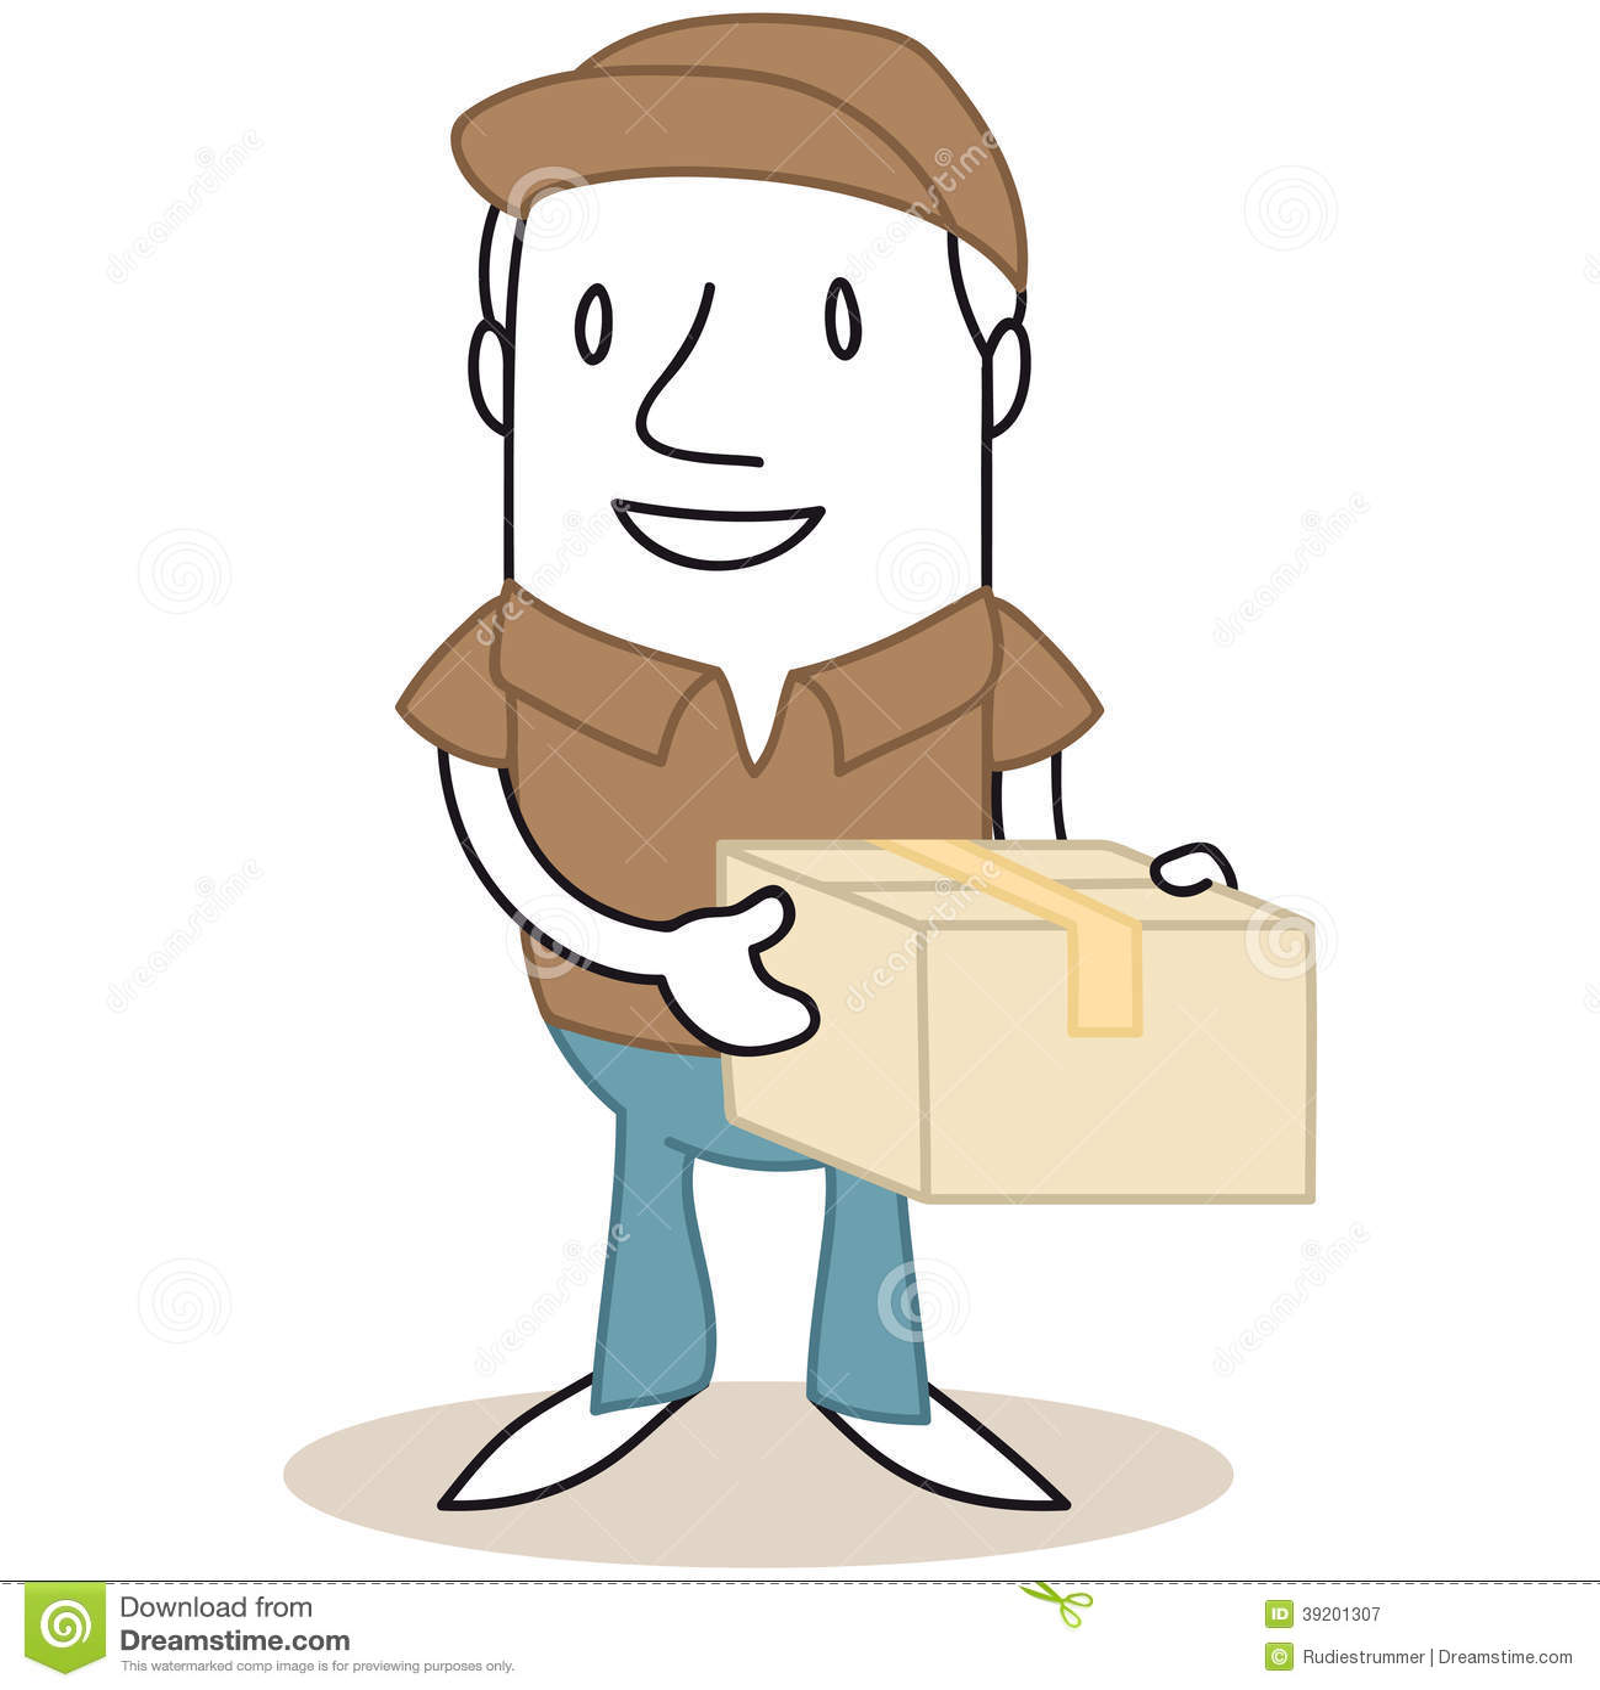 Cartoon Characters Holding Hands : Cartoon mailman holding parcel stock vector image